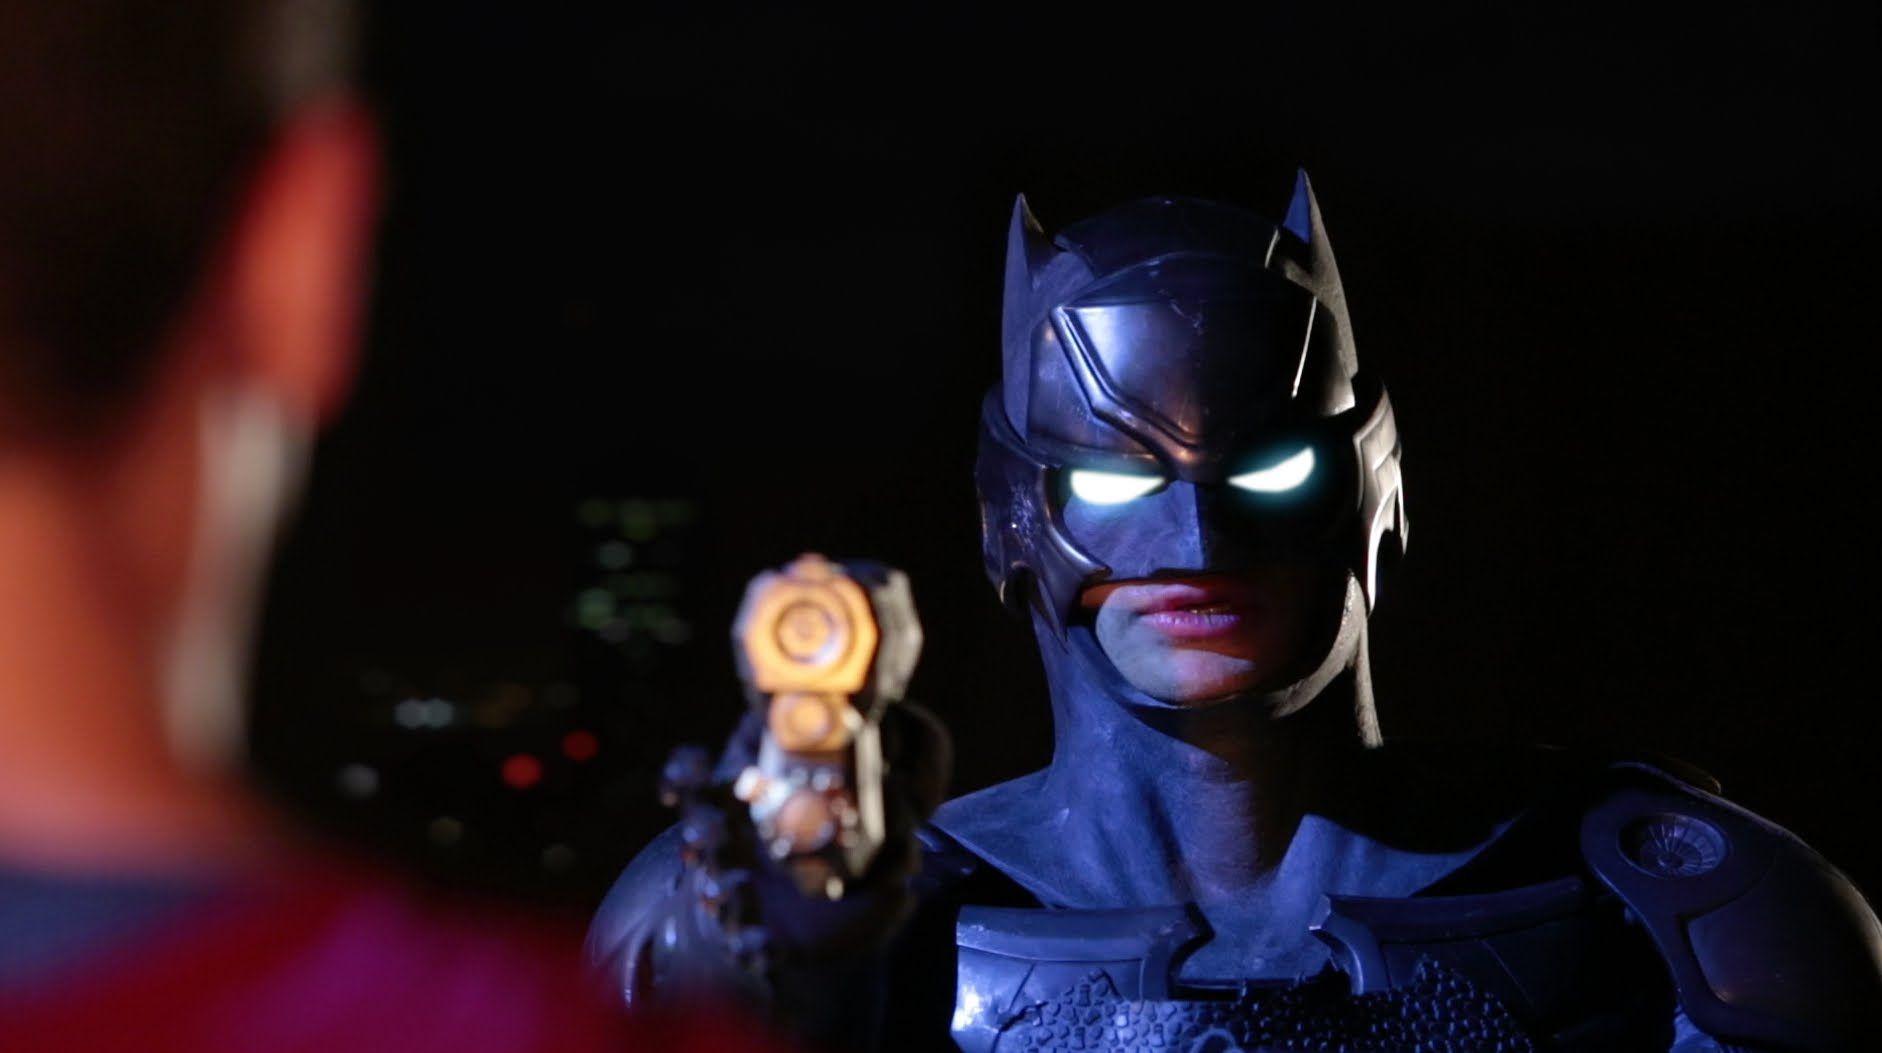 Batman Porno batman v. superman porno parodie – trailer | batman